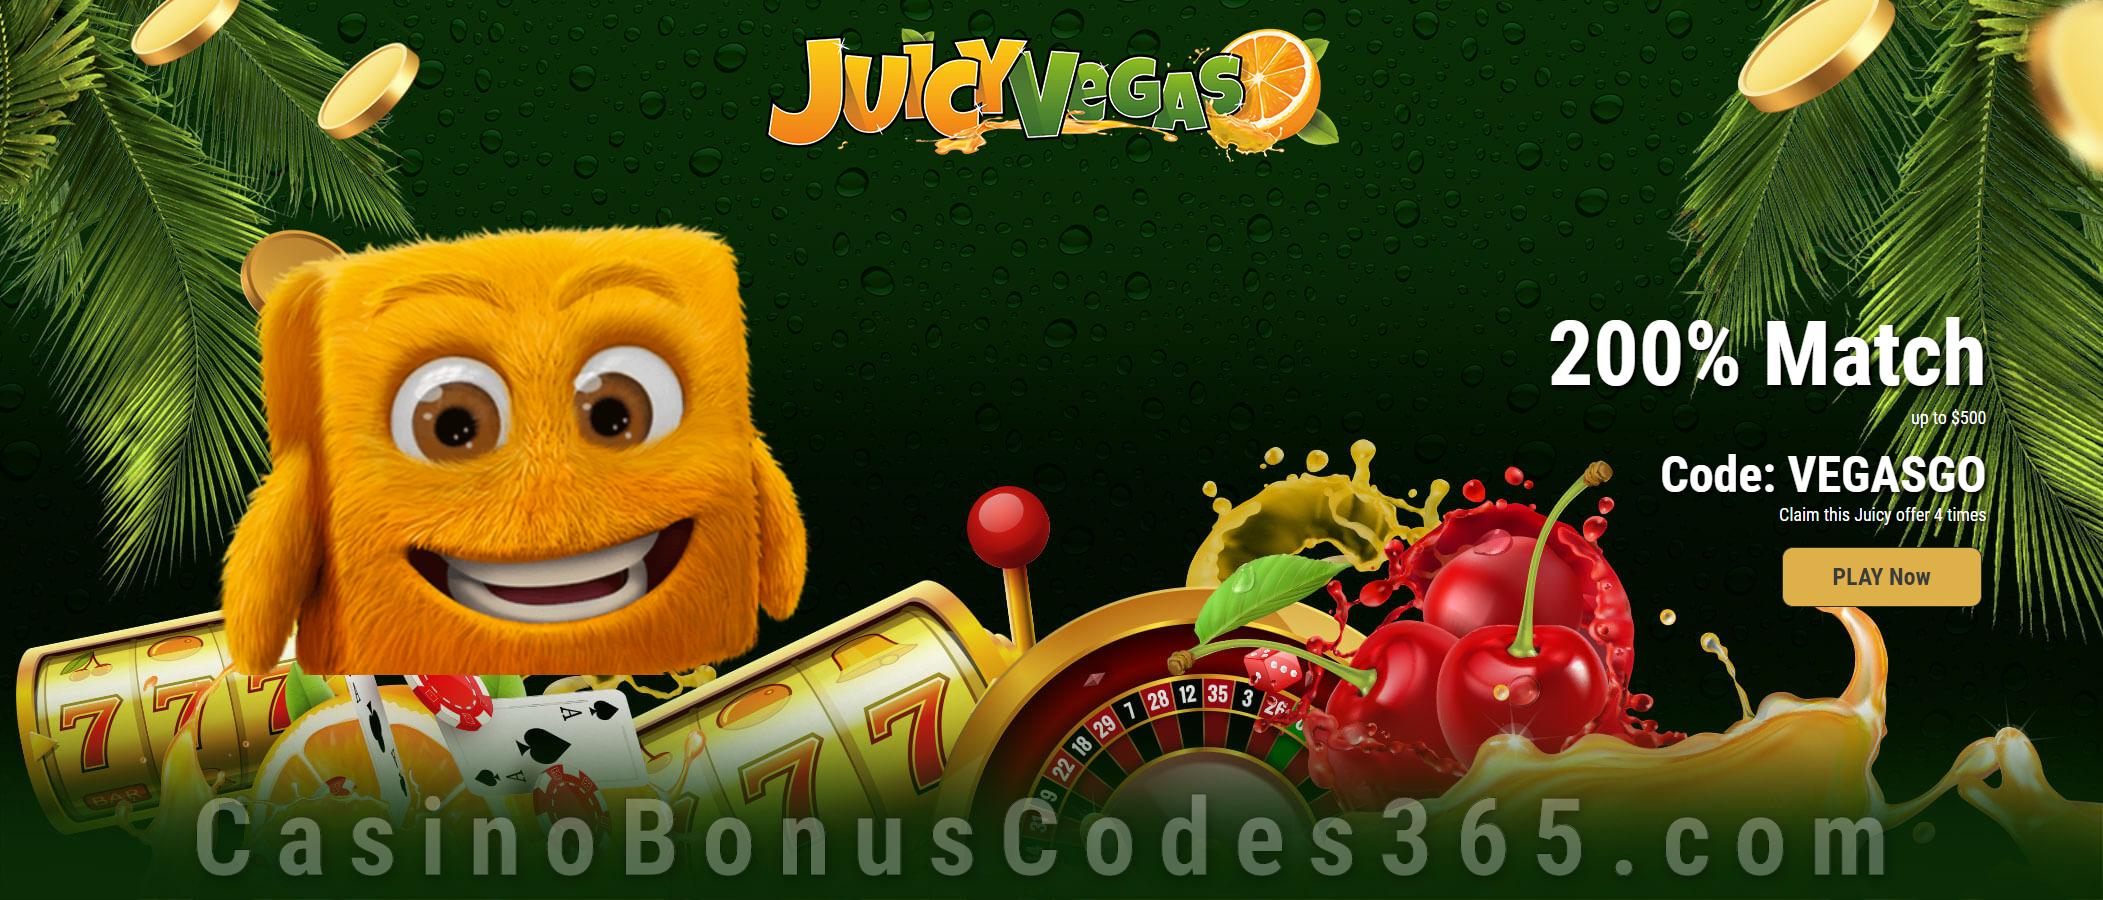 Juicy Vegas 200% Match Welcome Bonus